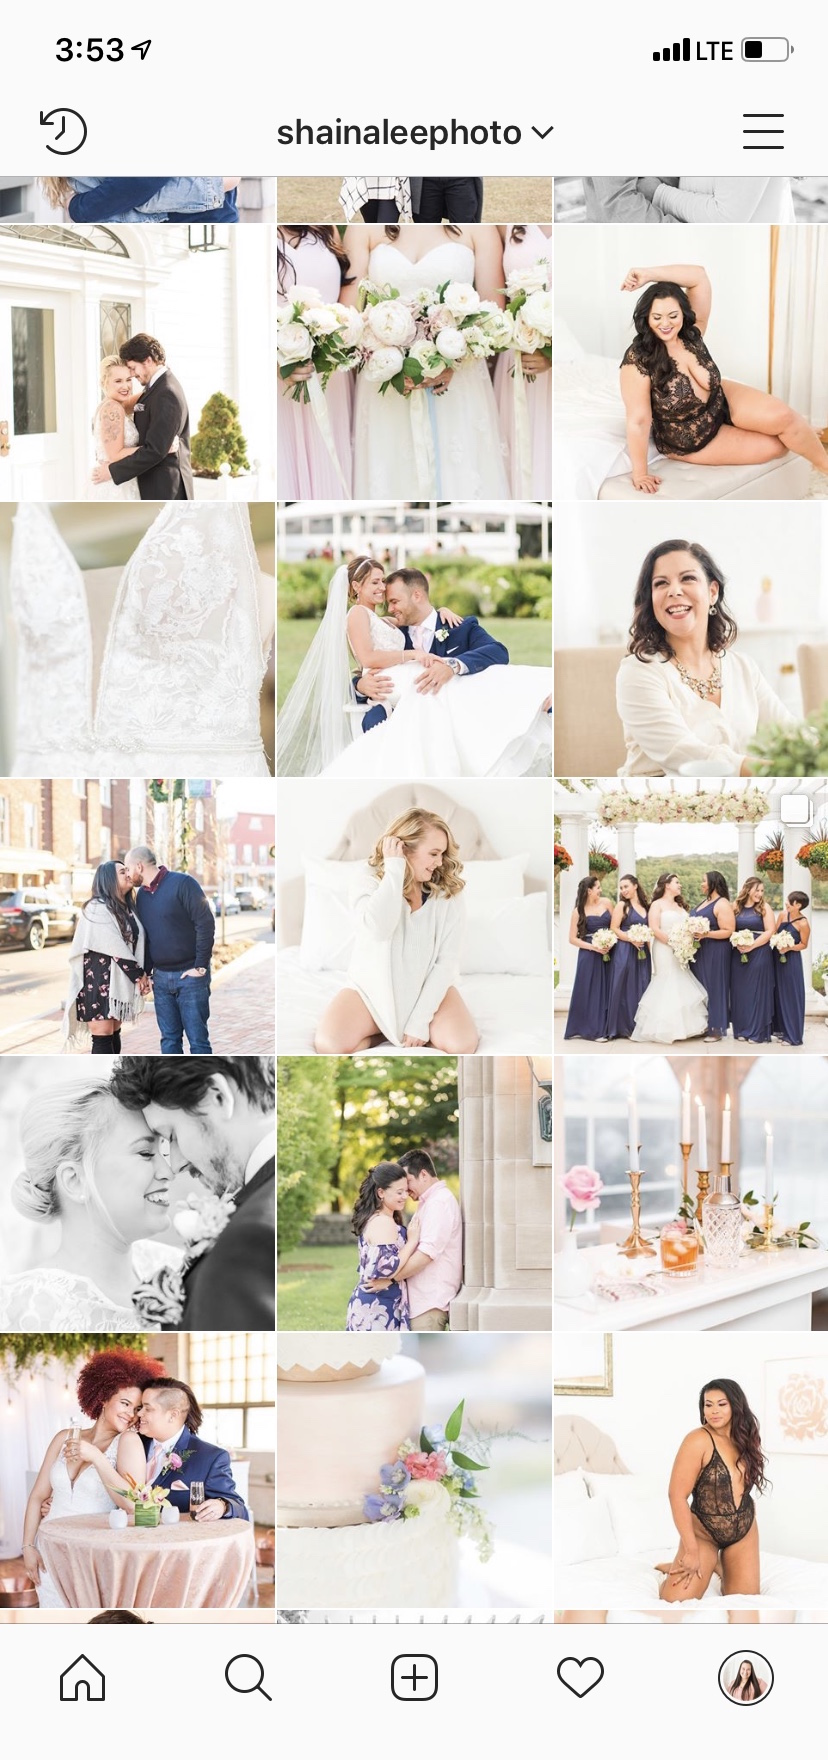 how-to-create-a-cohesive-instagram-grid-wedding-photography-education-ct-nyc-photographer-shaina-lee-photo.JPEG